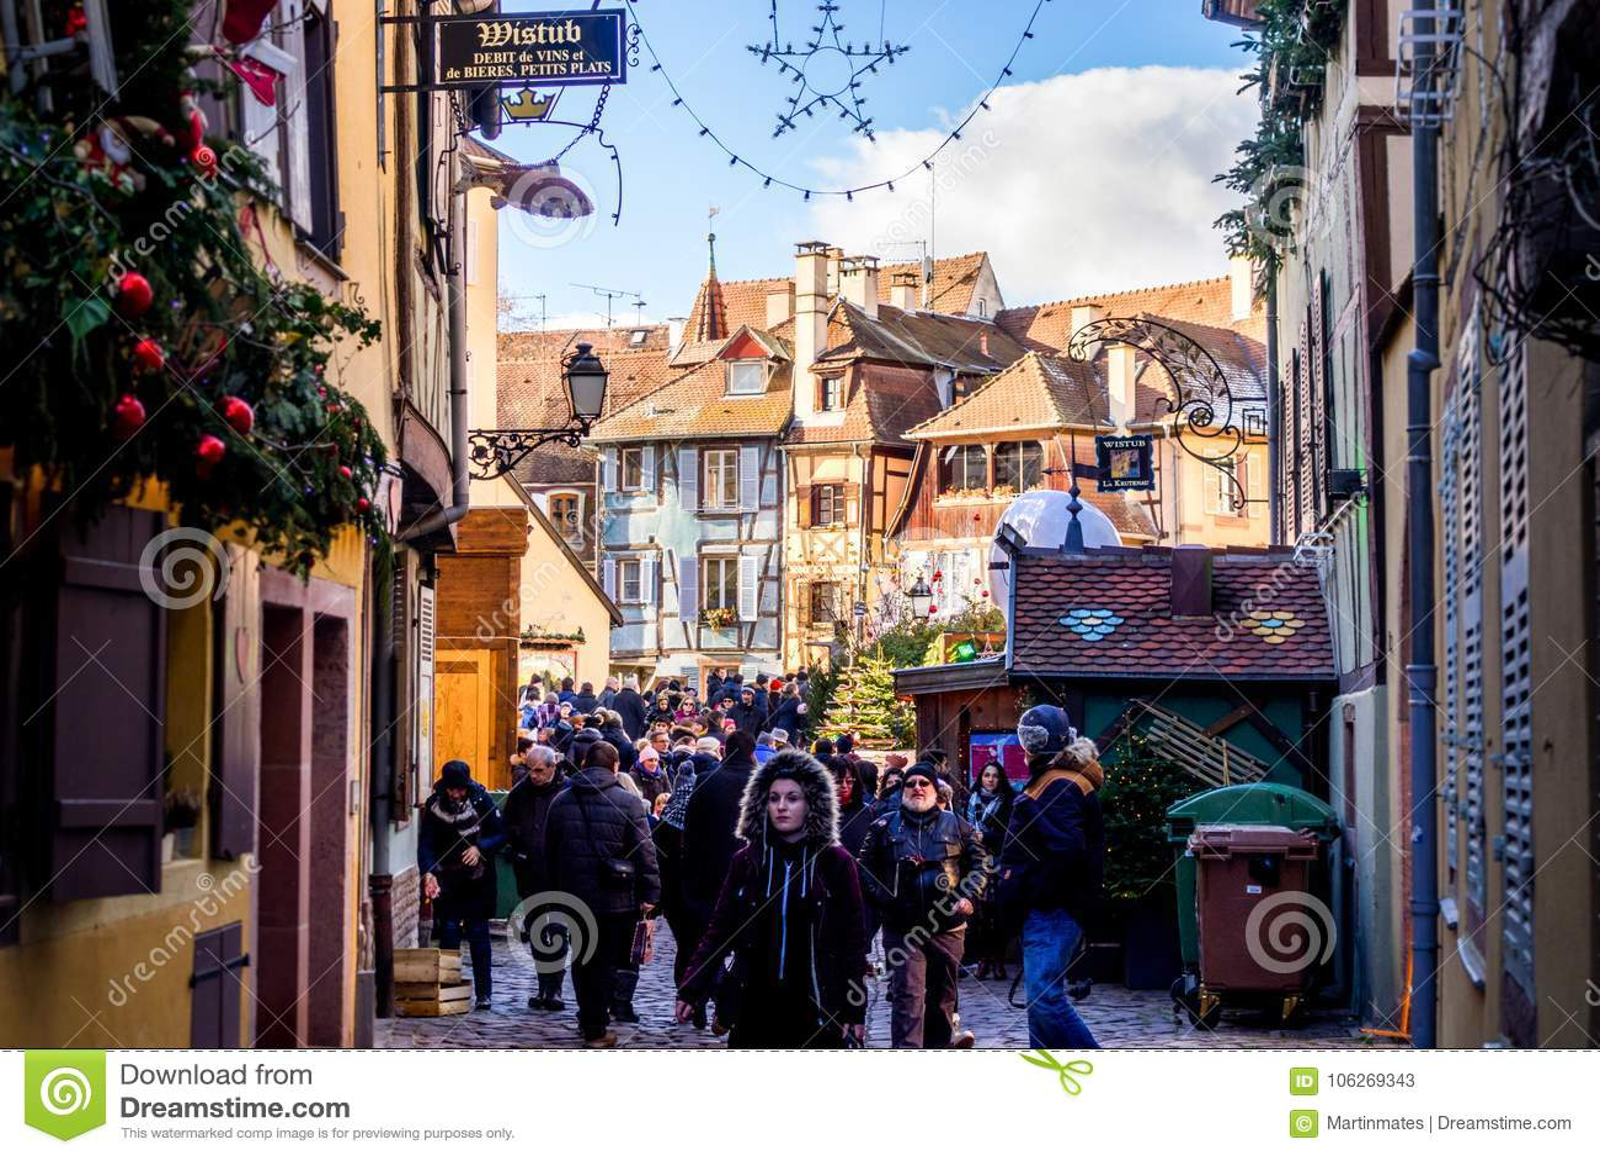 Christmas market visitors in Colmar